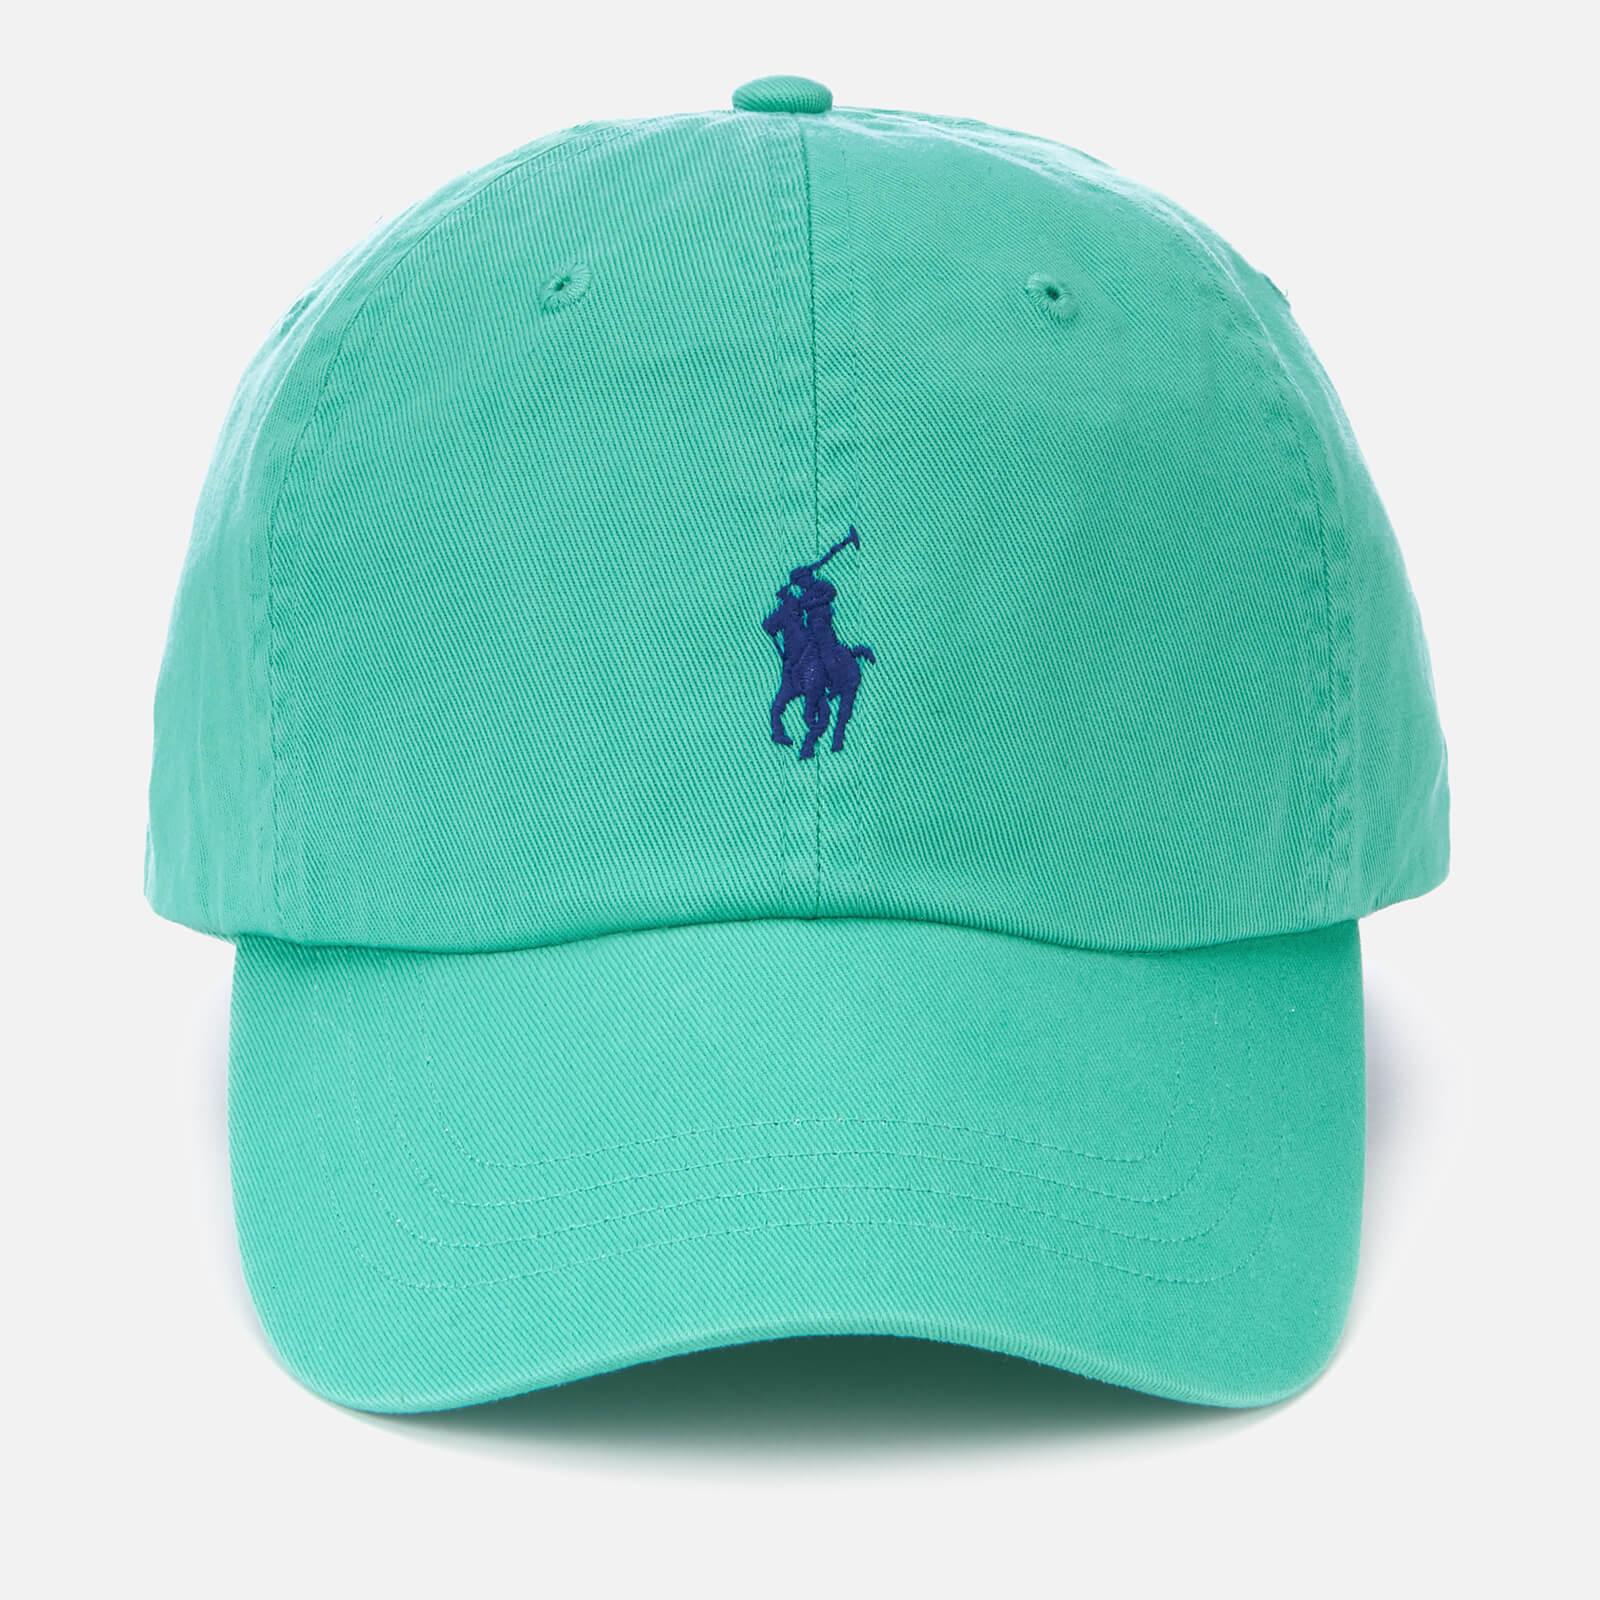 36edea64 Polo Ralph Lauren Men's Cap - Sunset Green - Free UK Delivery over £50